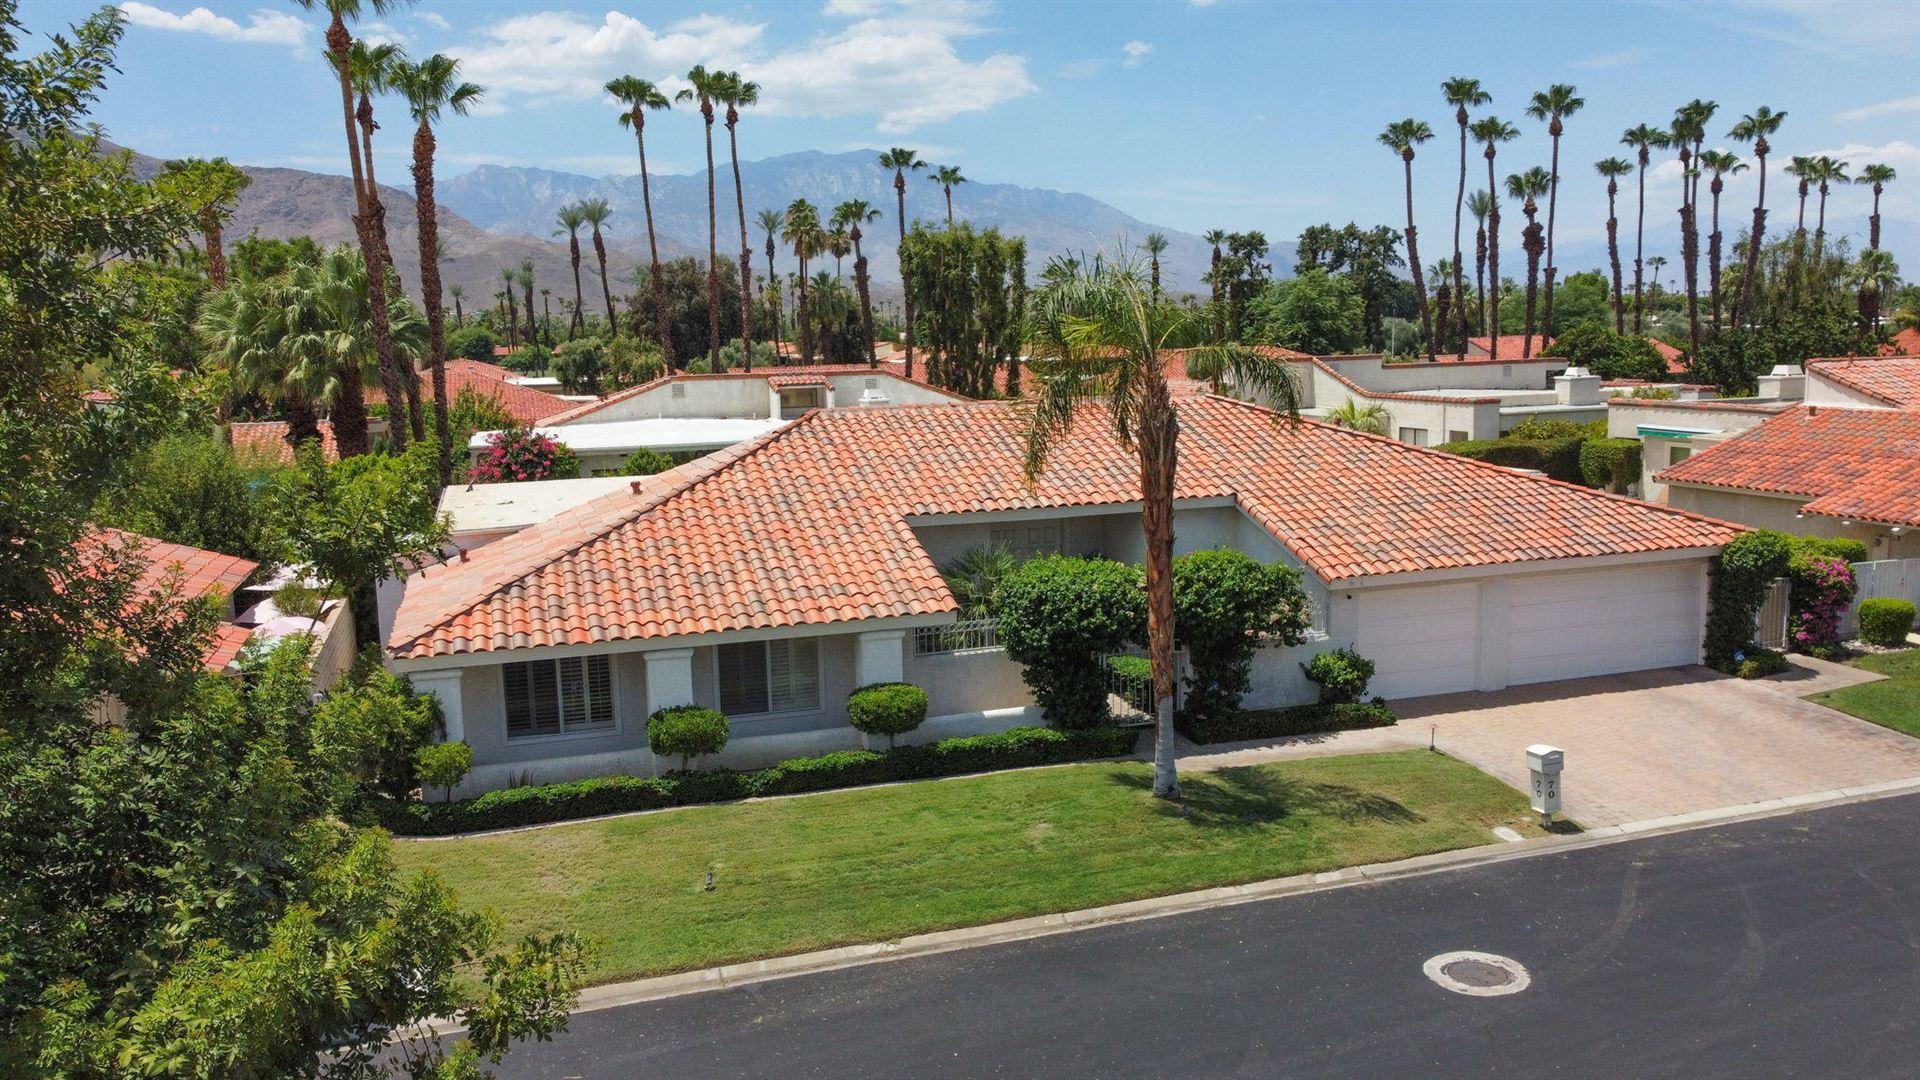 70 Magdalena Dr Drive, Rancho Mirage, CA 92270 - MLS#: 219064614